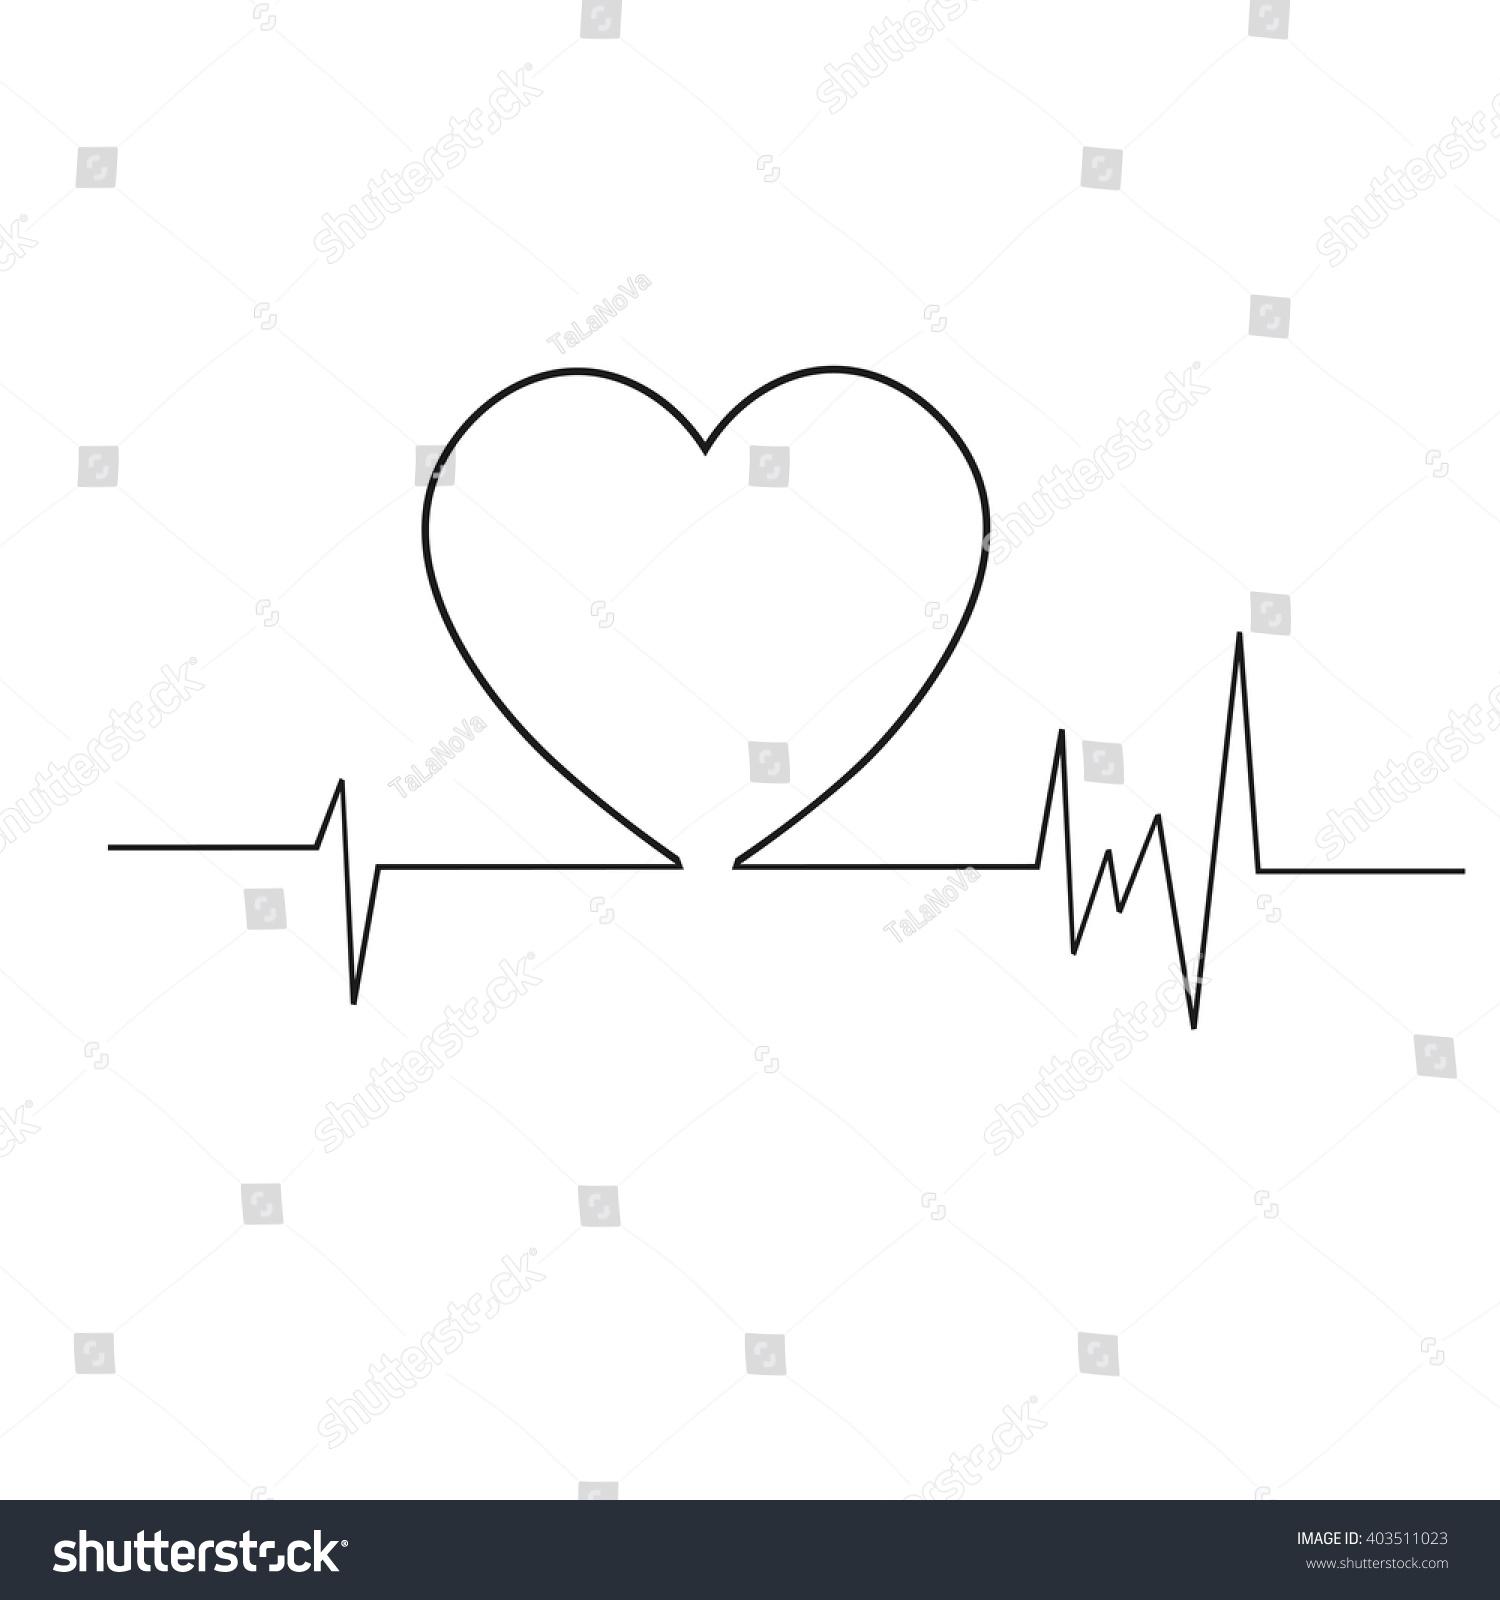 Heart Cardiogram Life Line Symbol Heart Stock Vector Royalty Free